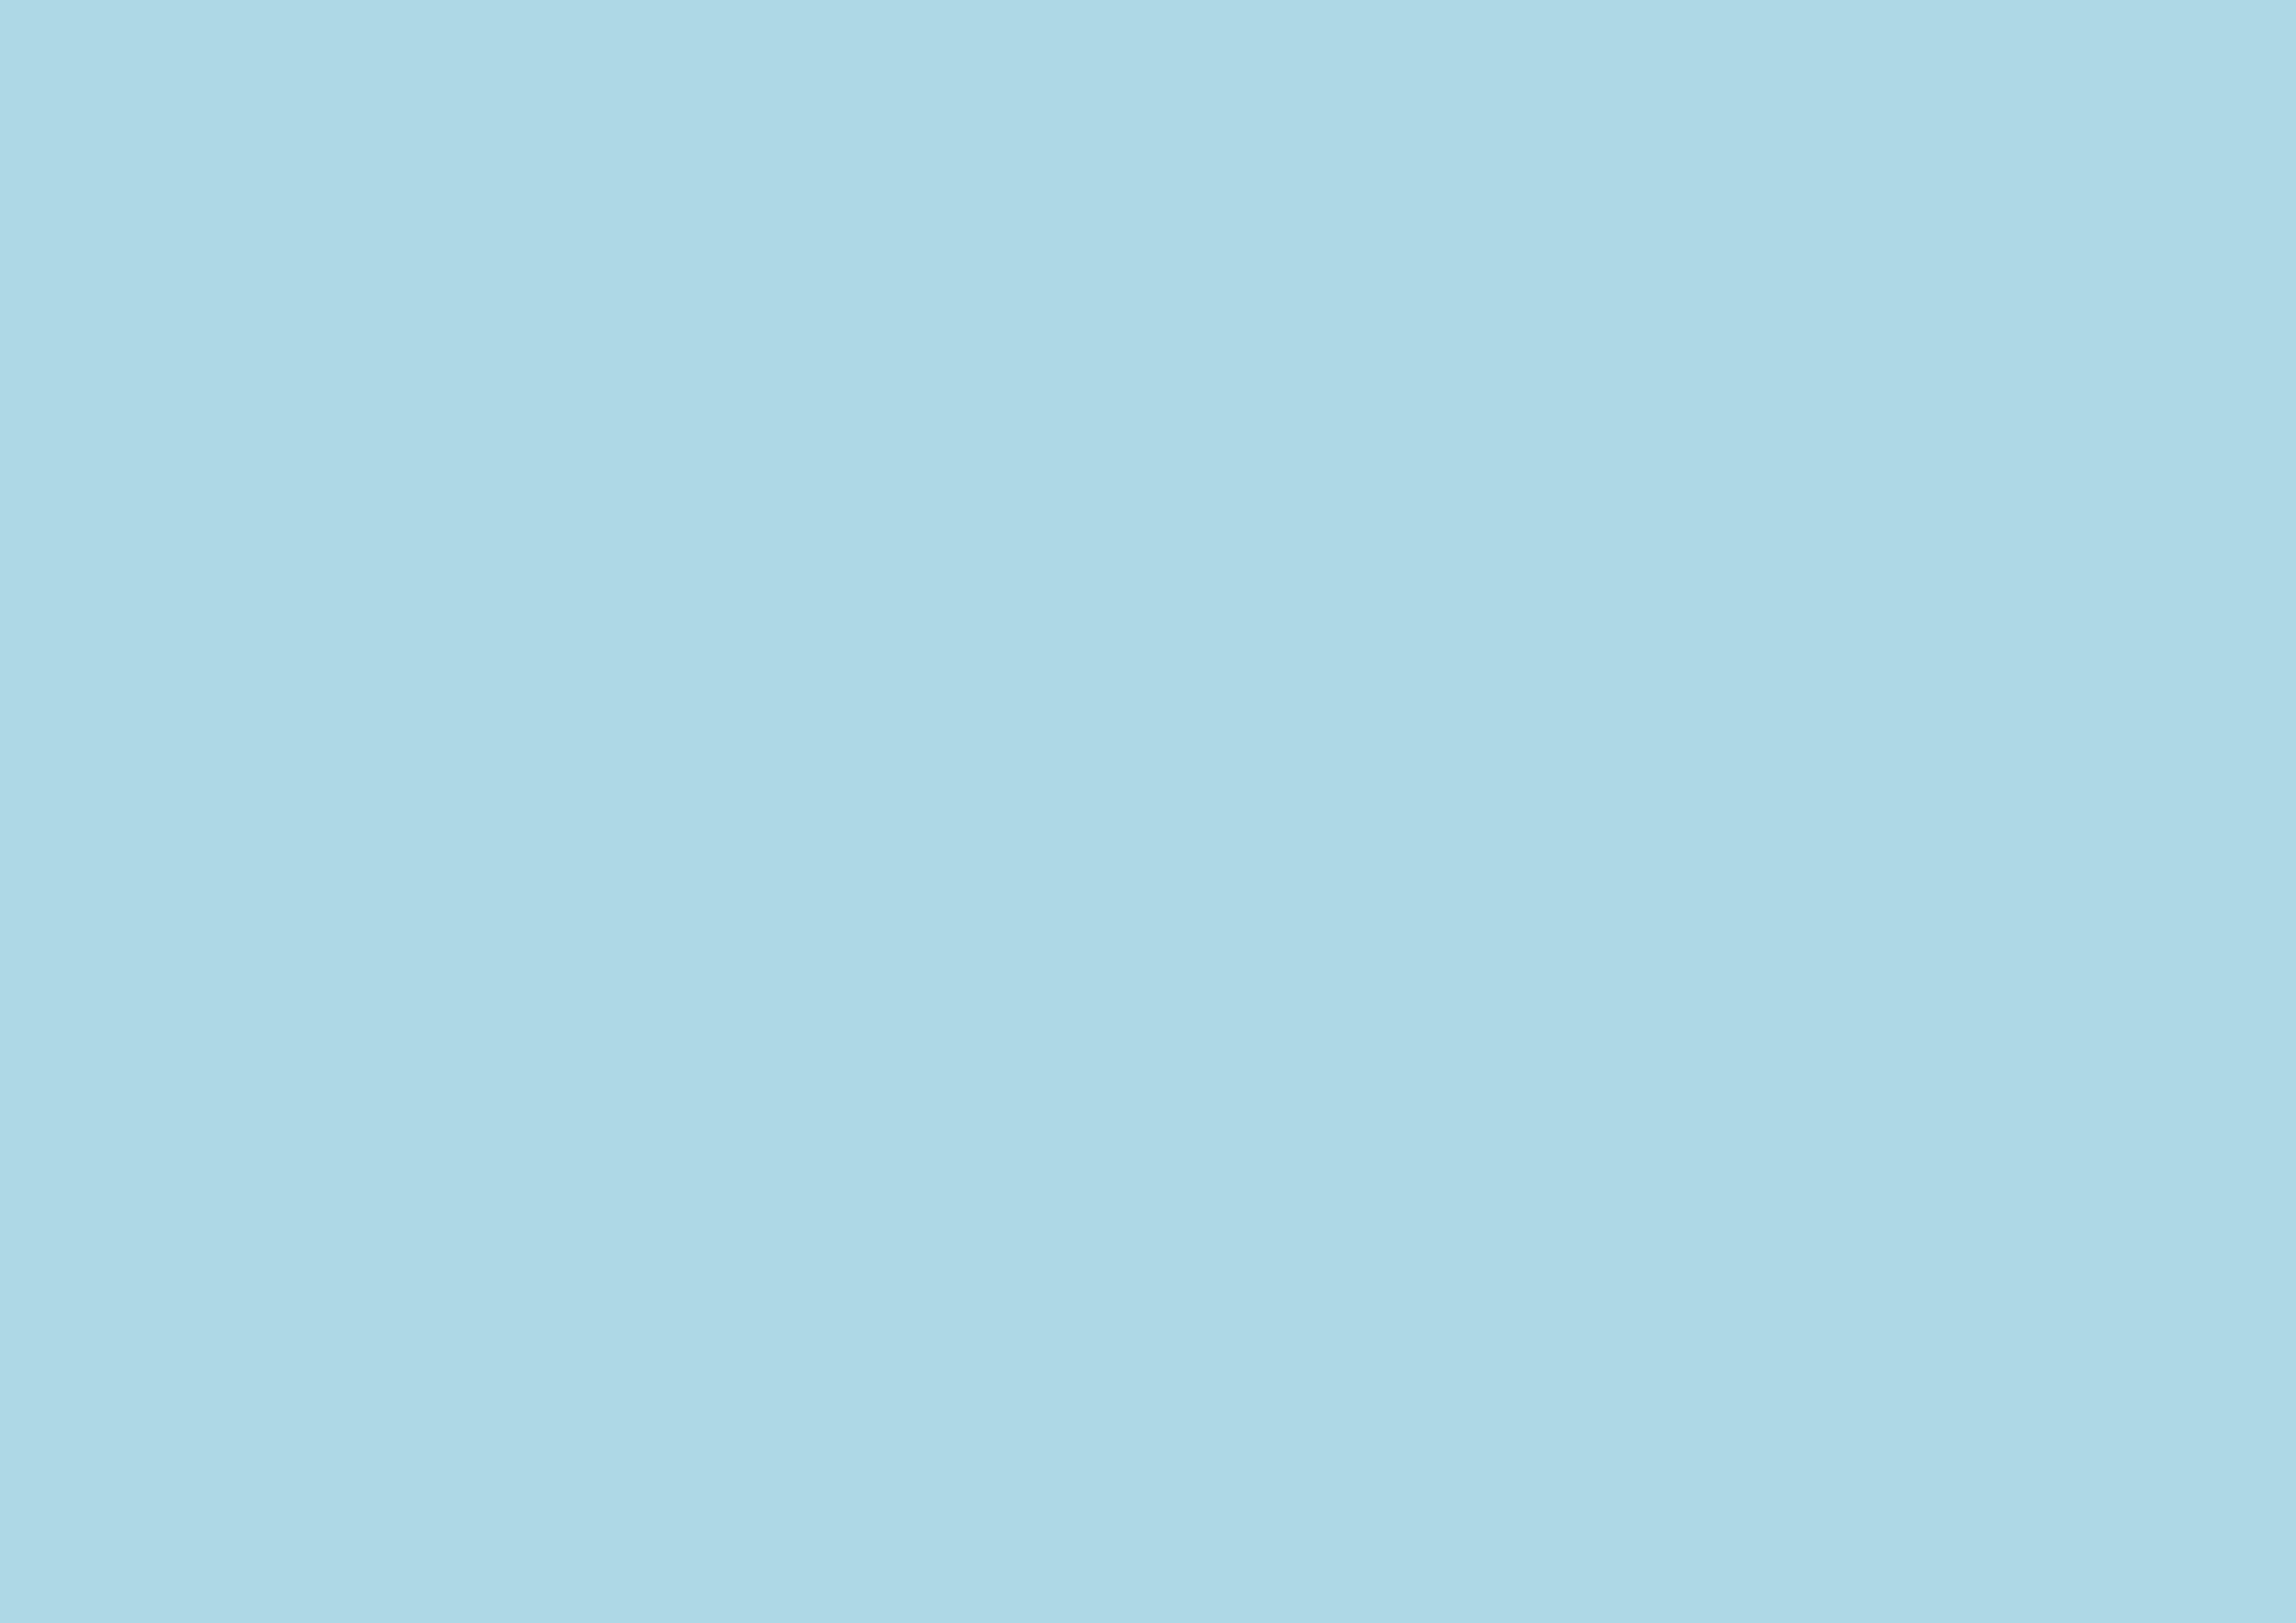 3508x2480 Light Blue Solid Color Background